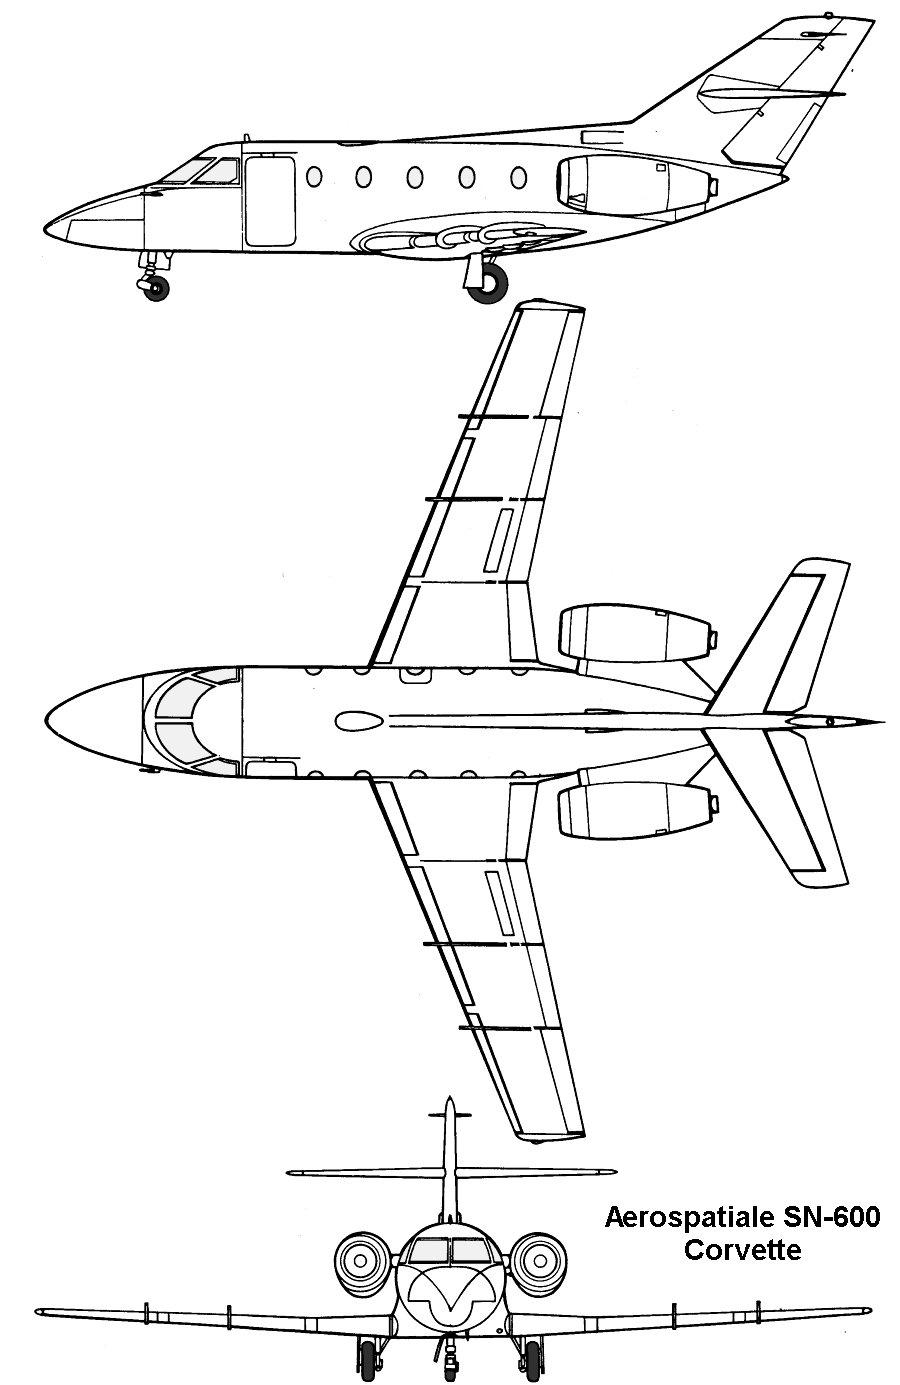 Aerospatiale corvette blueprint download free blueprint for 3d aerospatiale corvette blueprint malvernweather Gallery